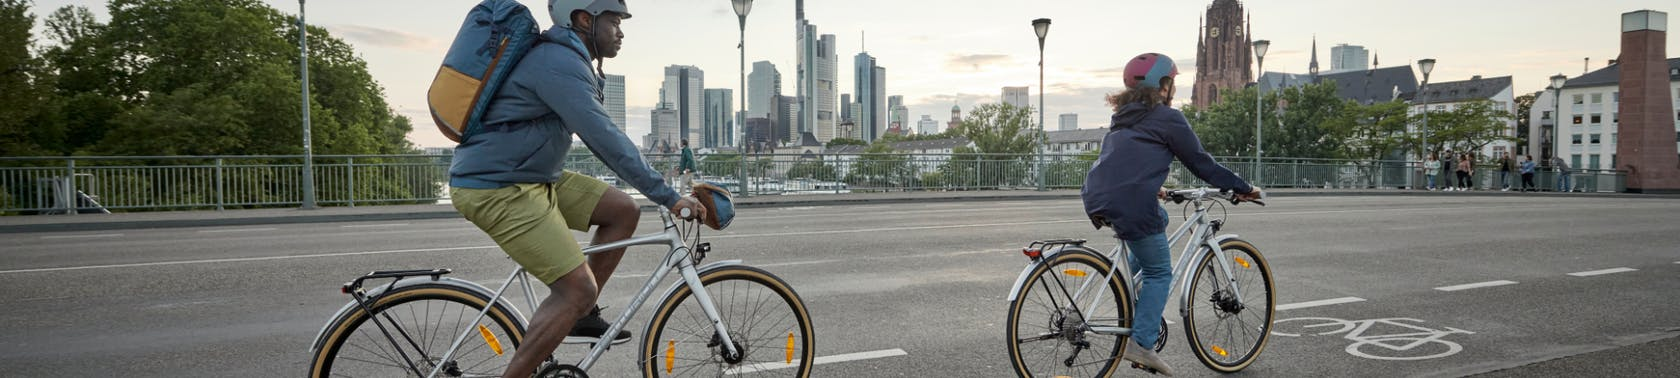 city bike onlineshop